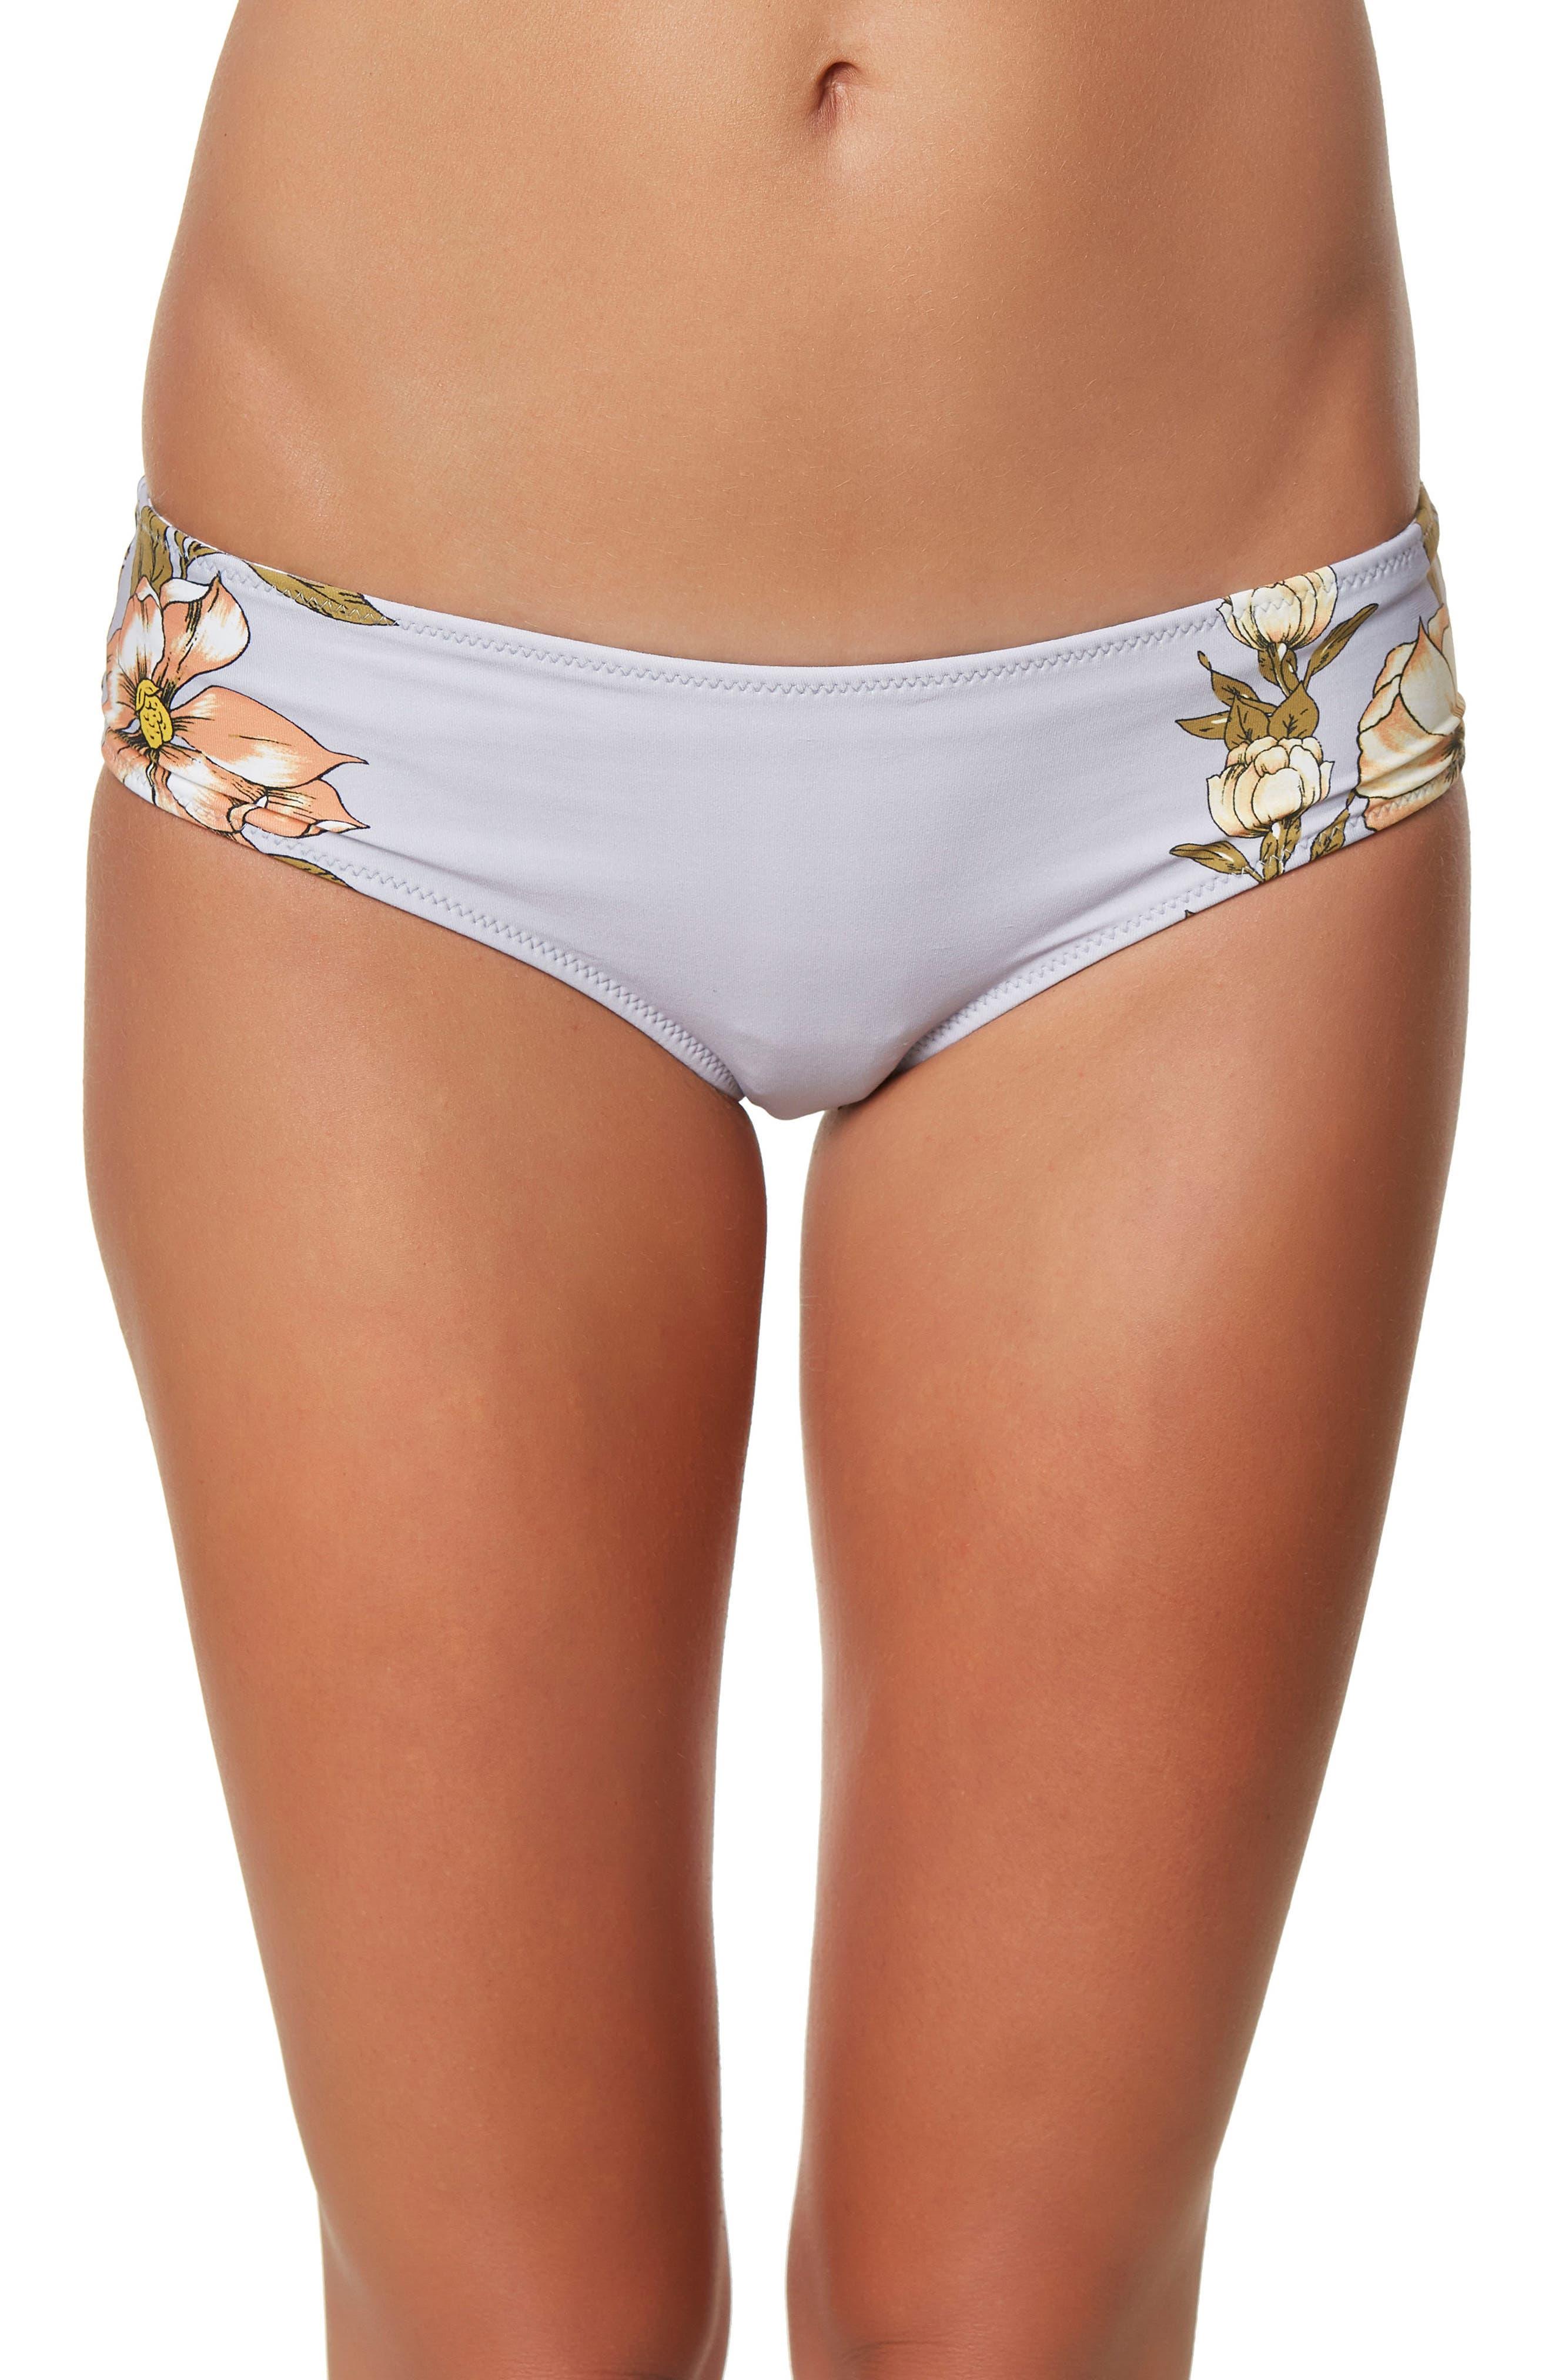 Alternate Image 1 Selected - O'Neill Aloha Floral Revo Hipster Bikini Bottoms